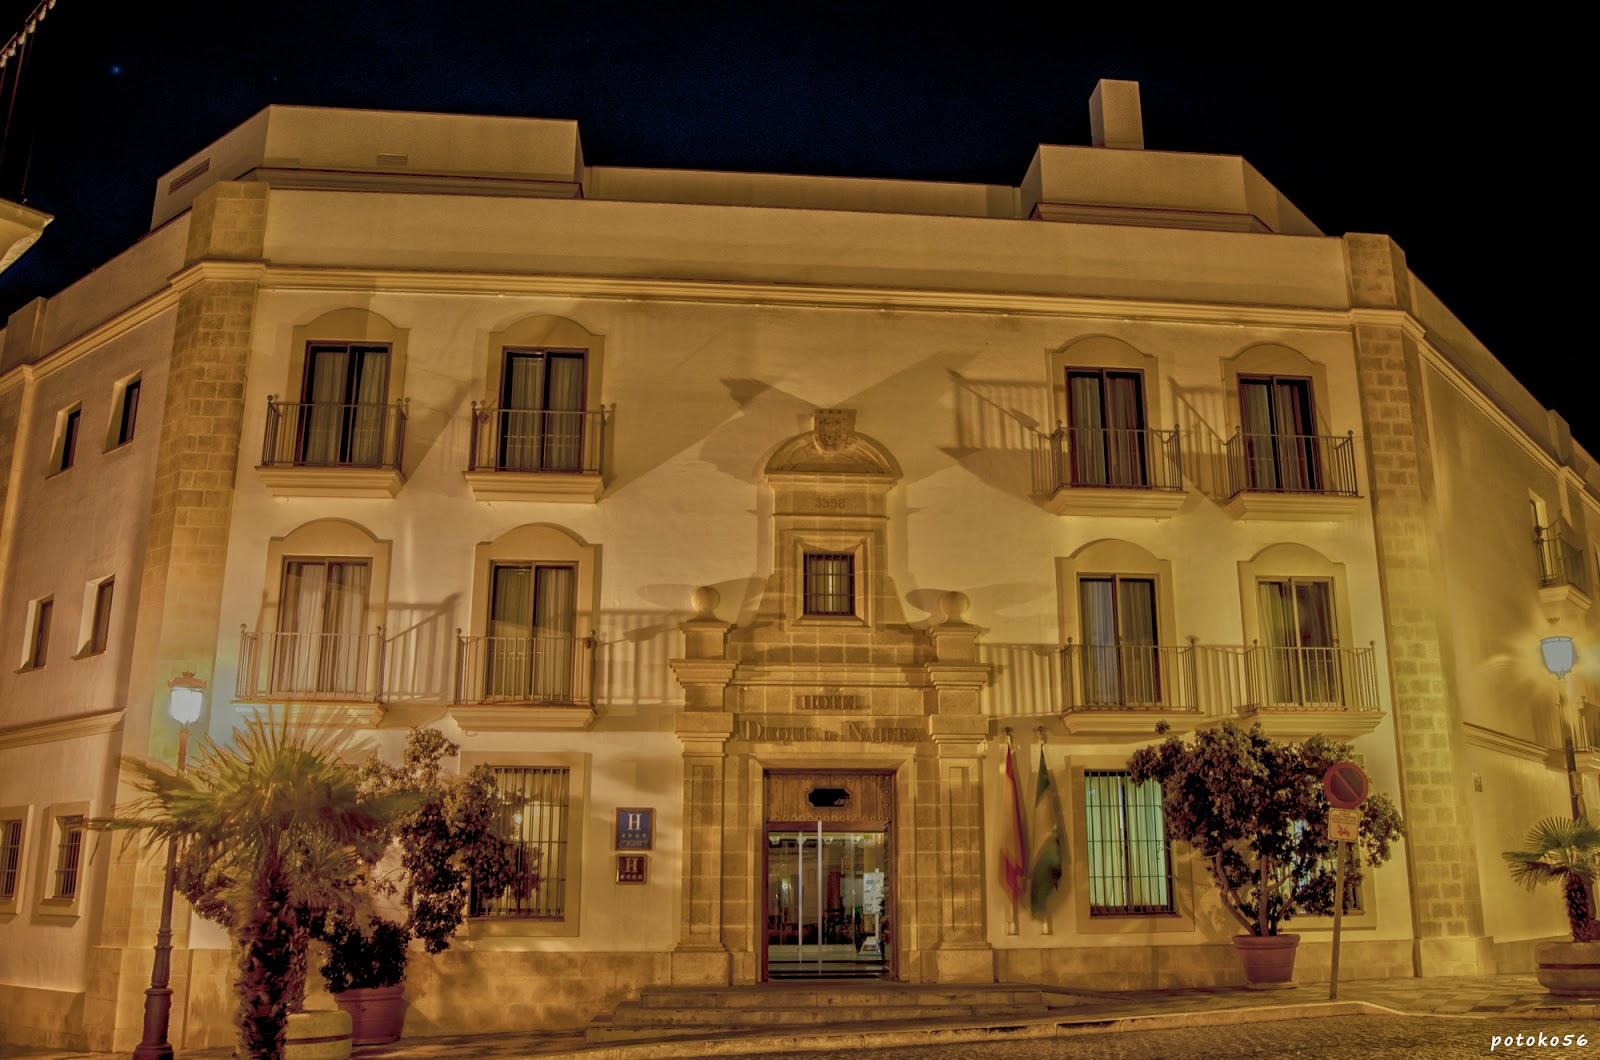 Hoteles con encanto  Hotel Duque de Nájera**** Rota